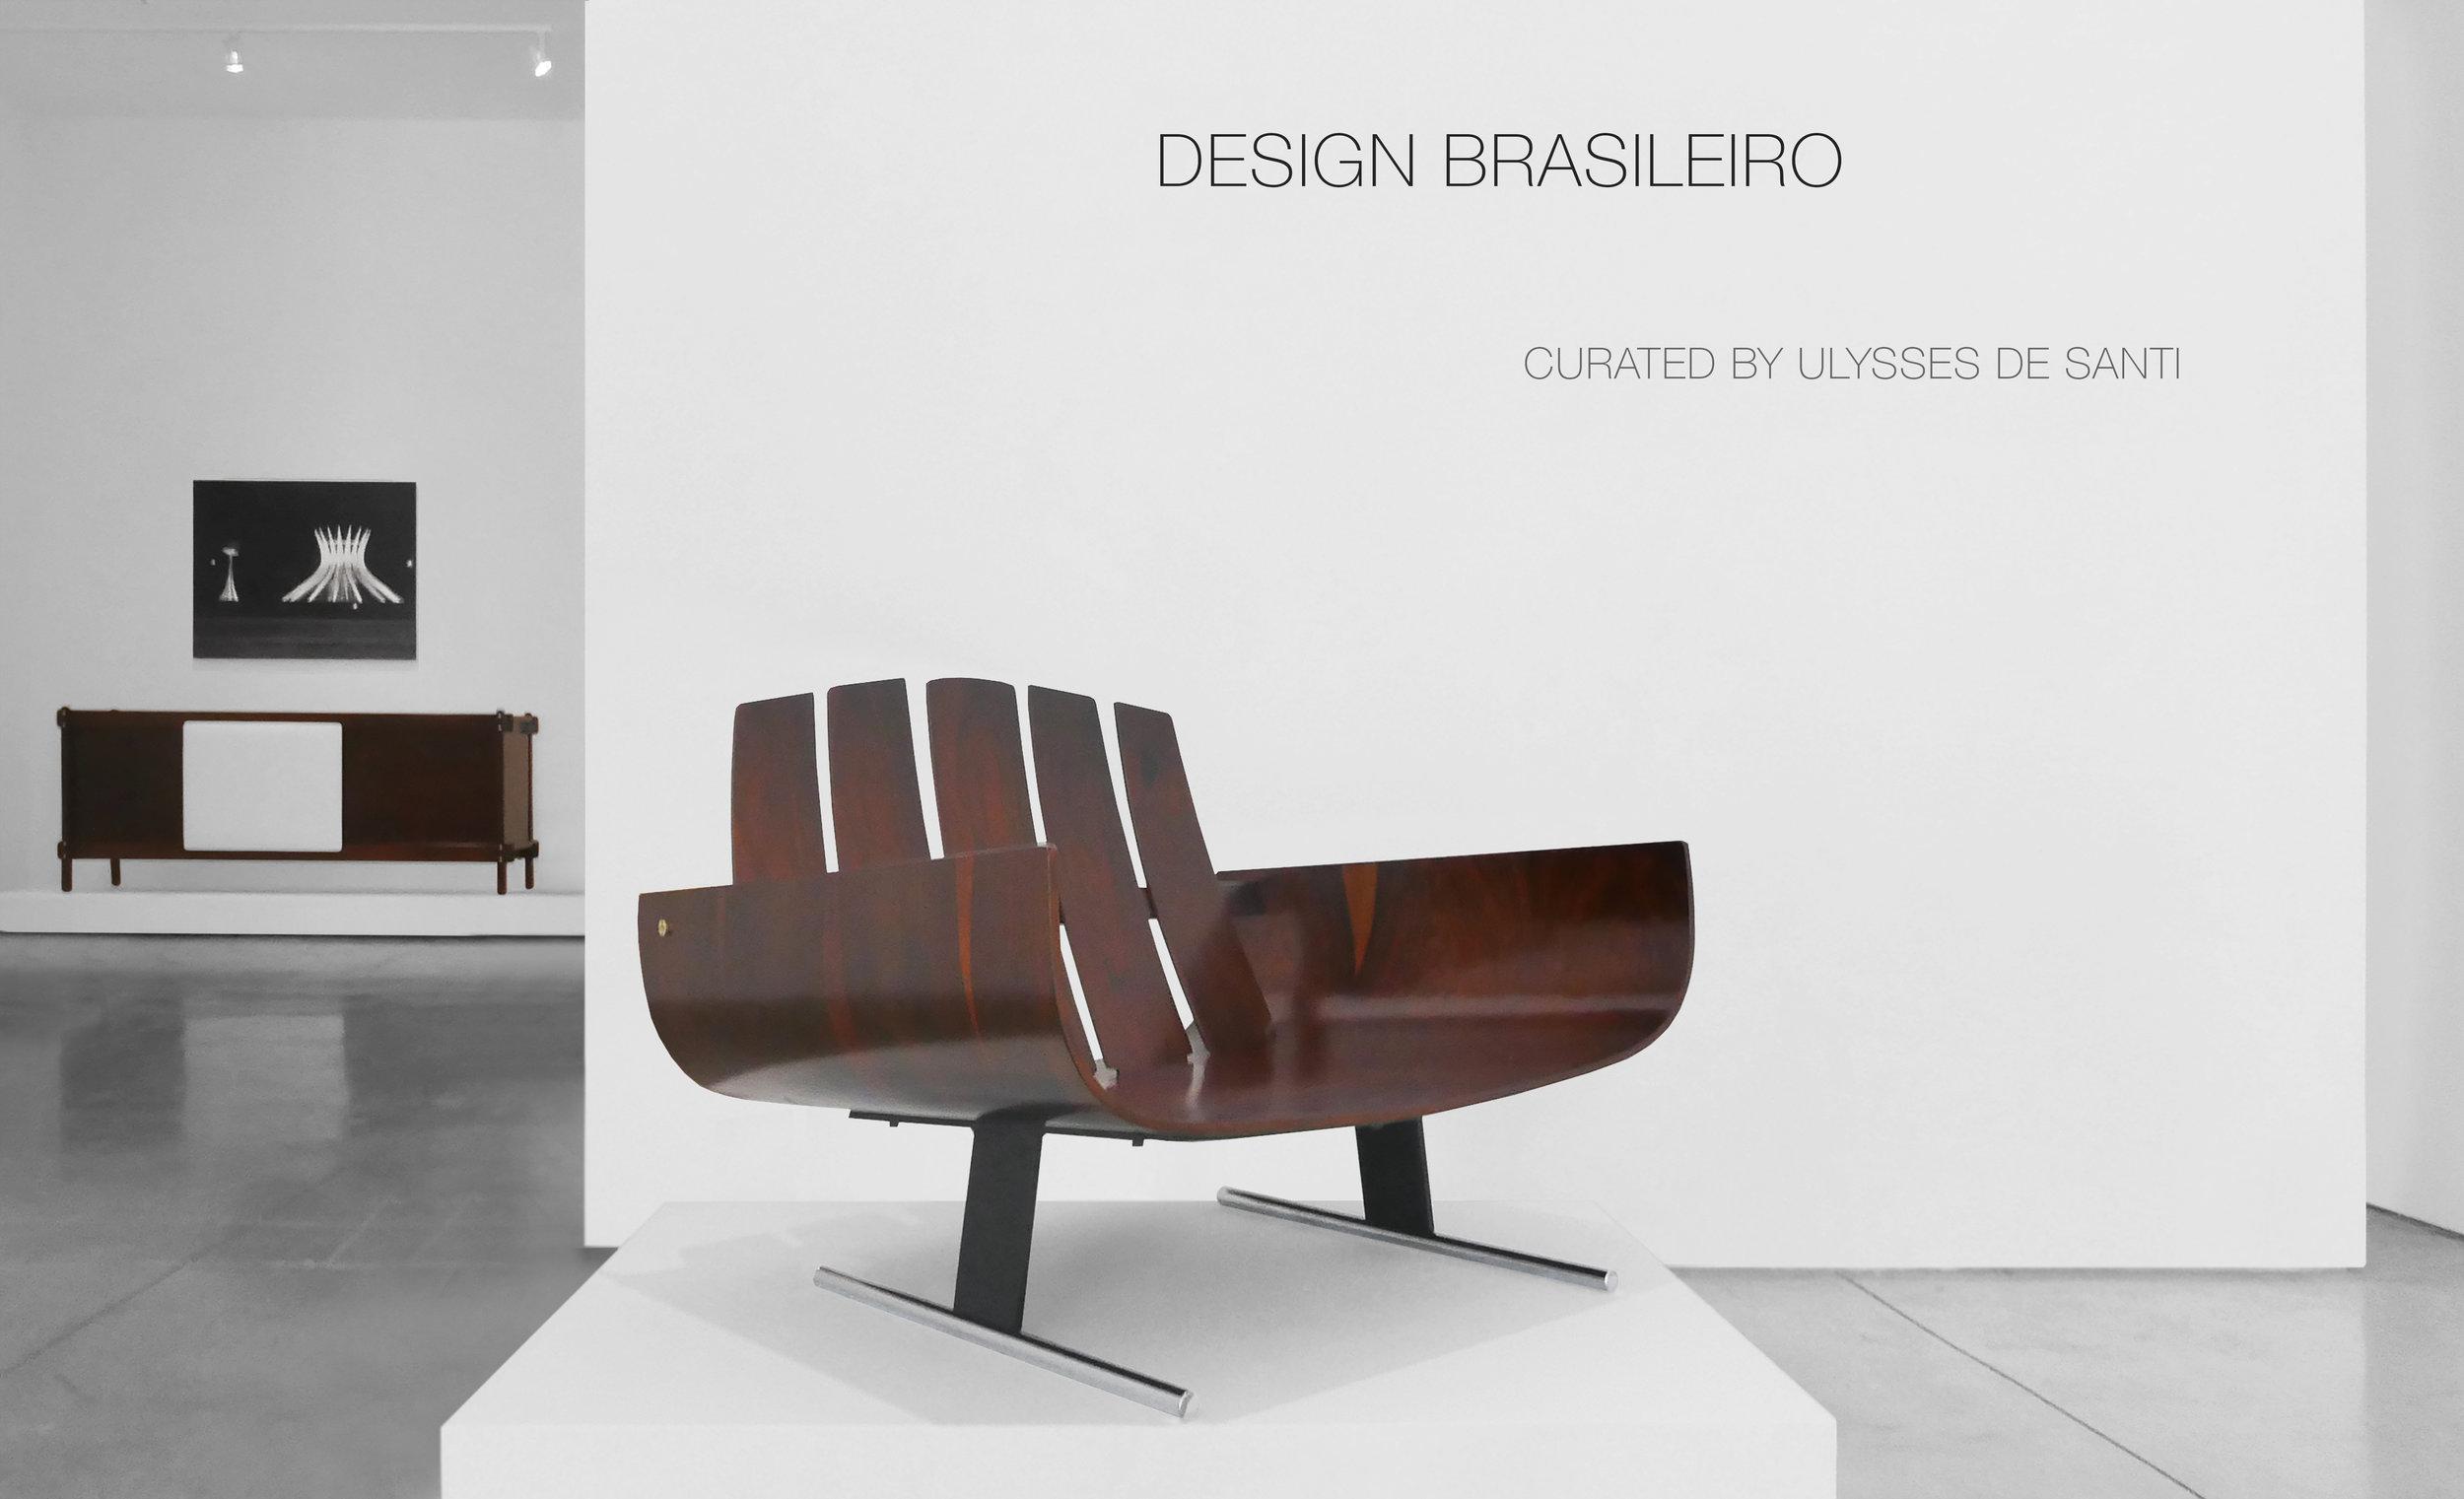 Design Brasileiro, Curated by Ulysses de Santi, Peter Blake Gallery, 2018, Installation View_5.jpg